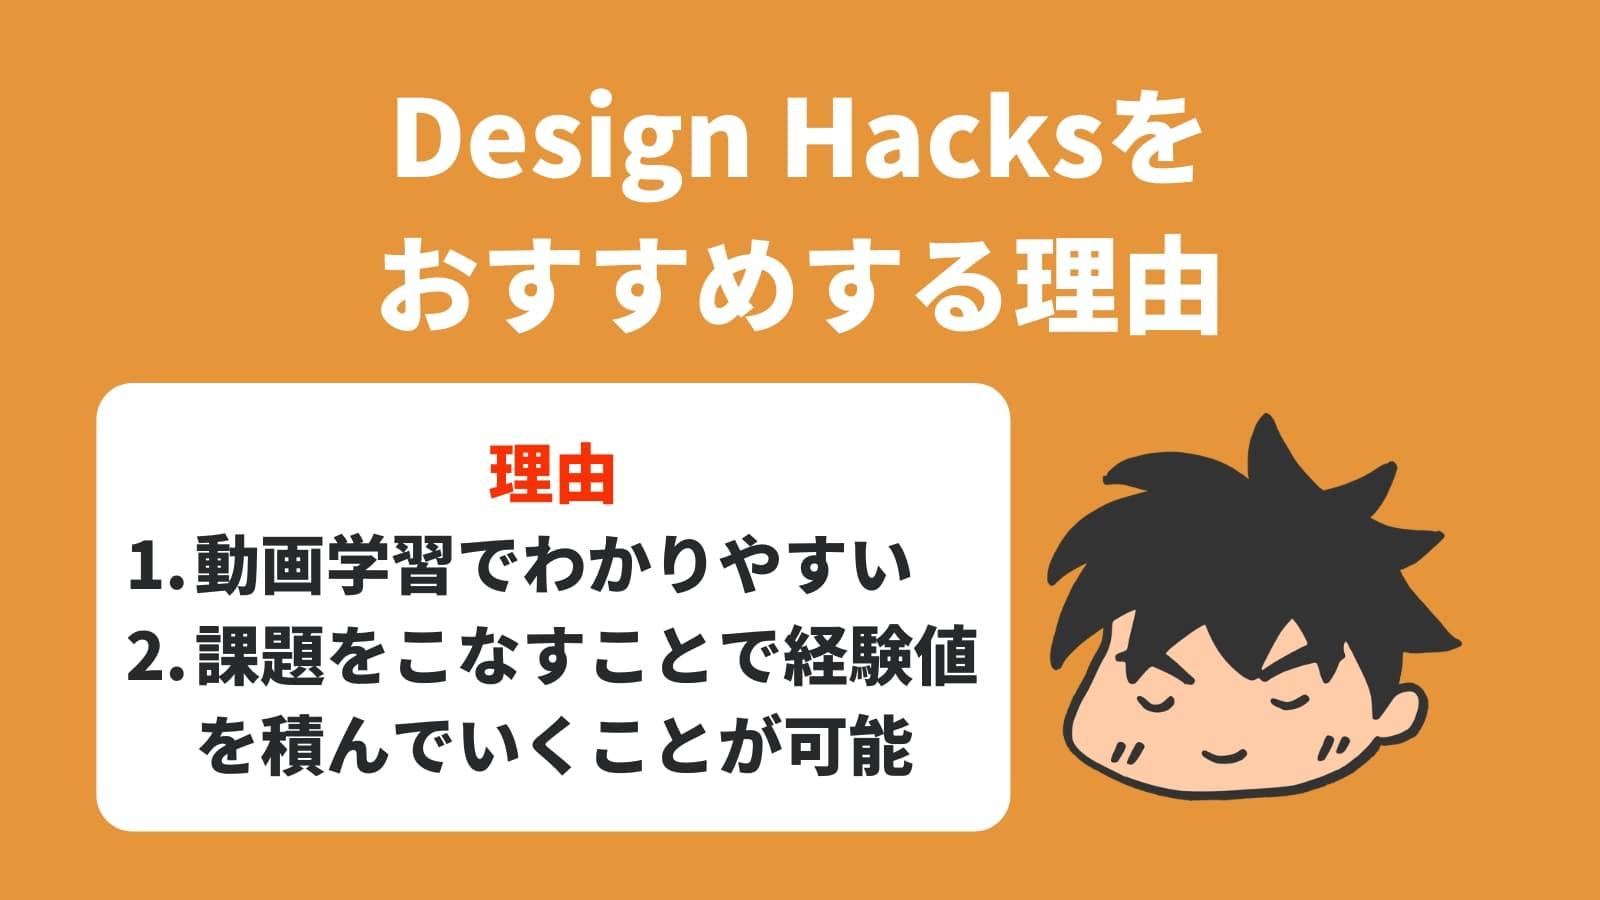 Design Hacksを おすすめする理由